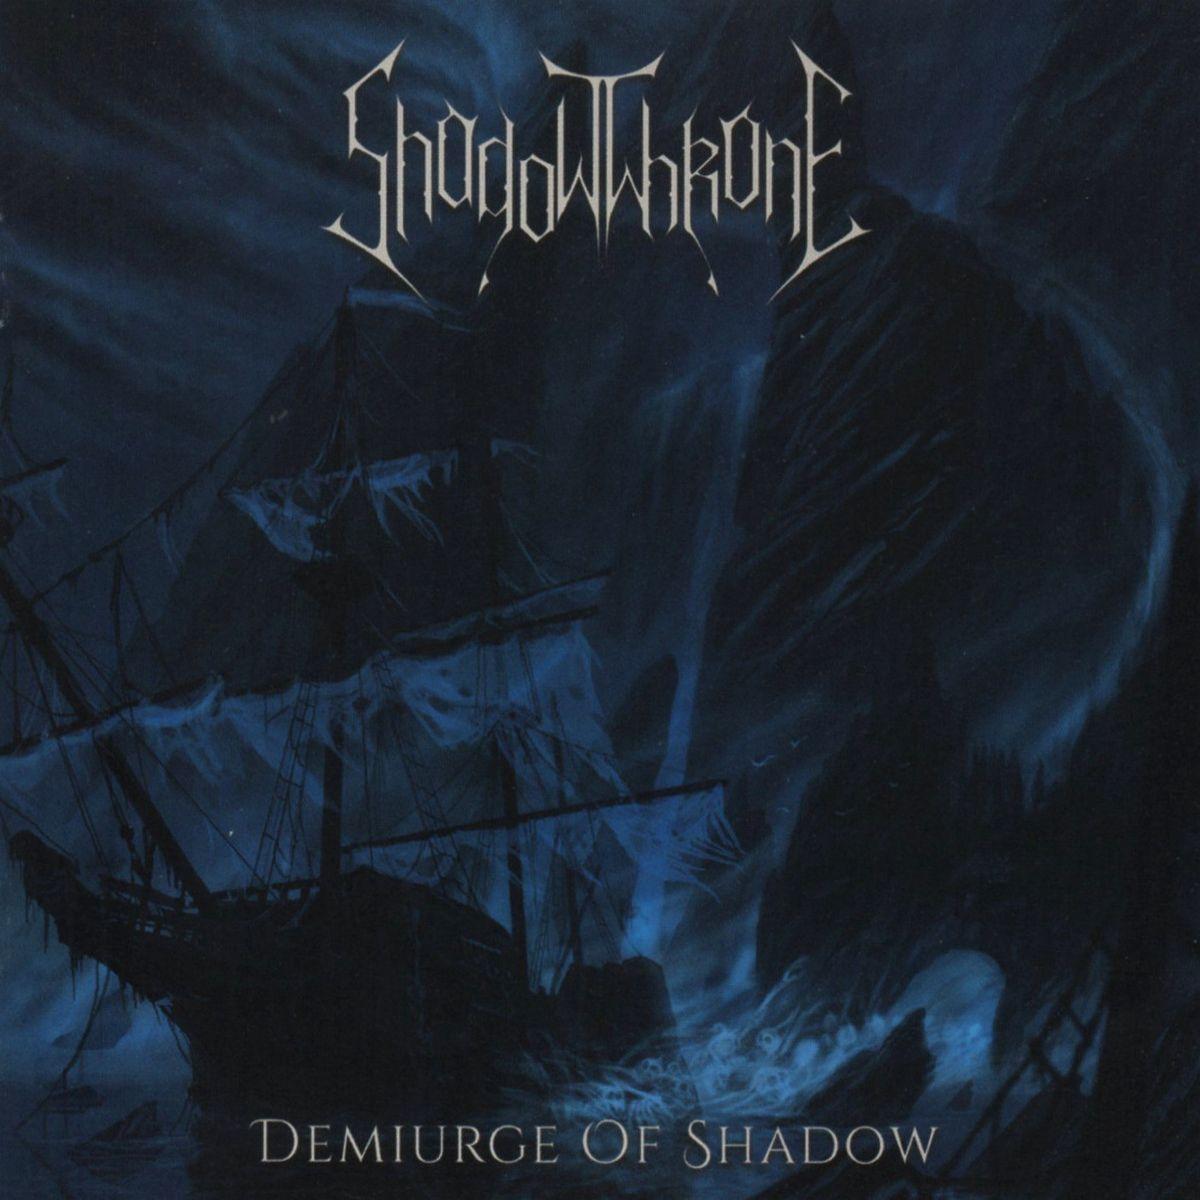 ShadowThrone (ITA) - Demiurge of Shadow